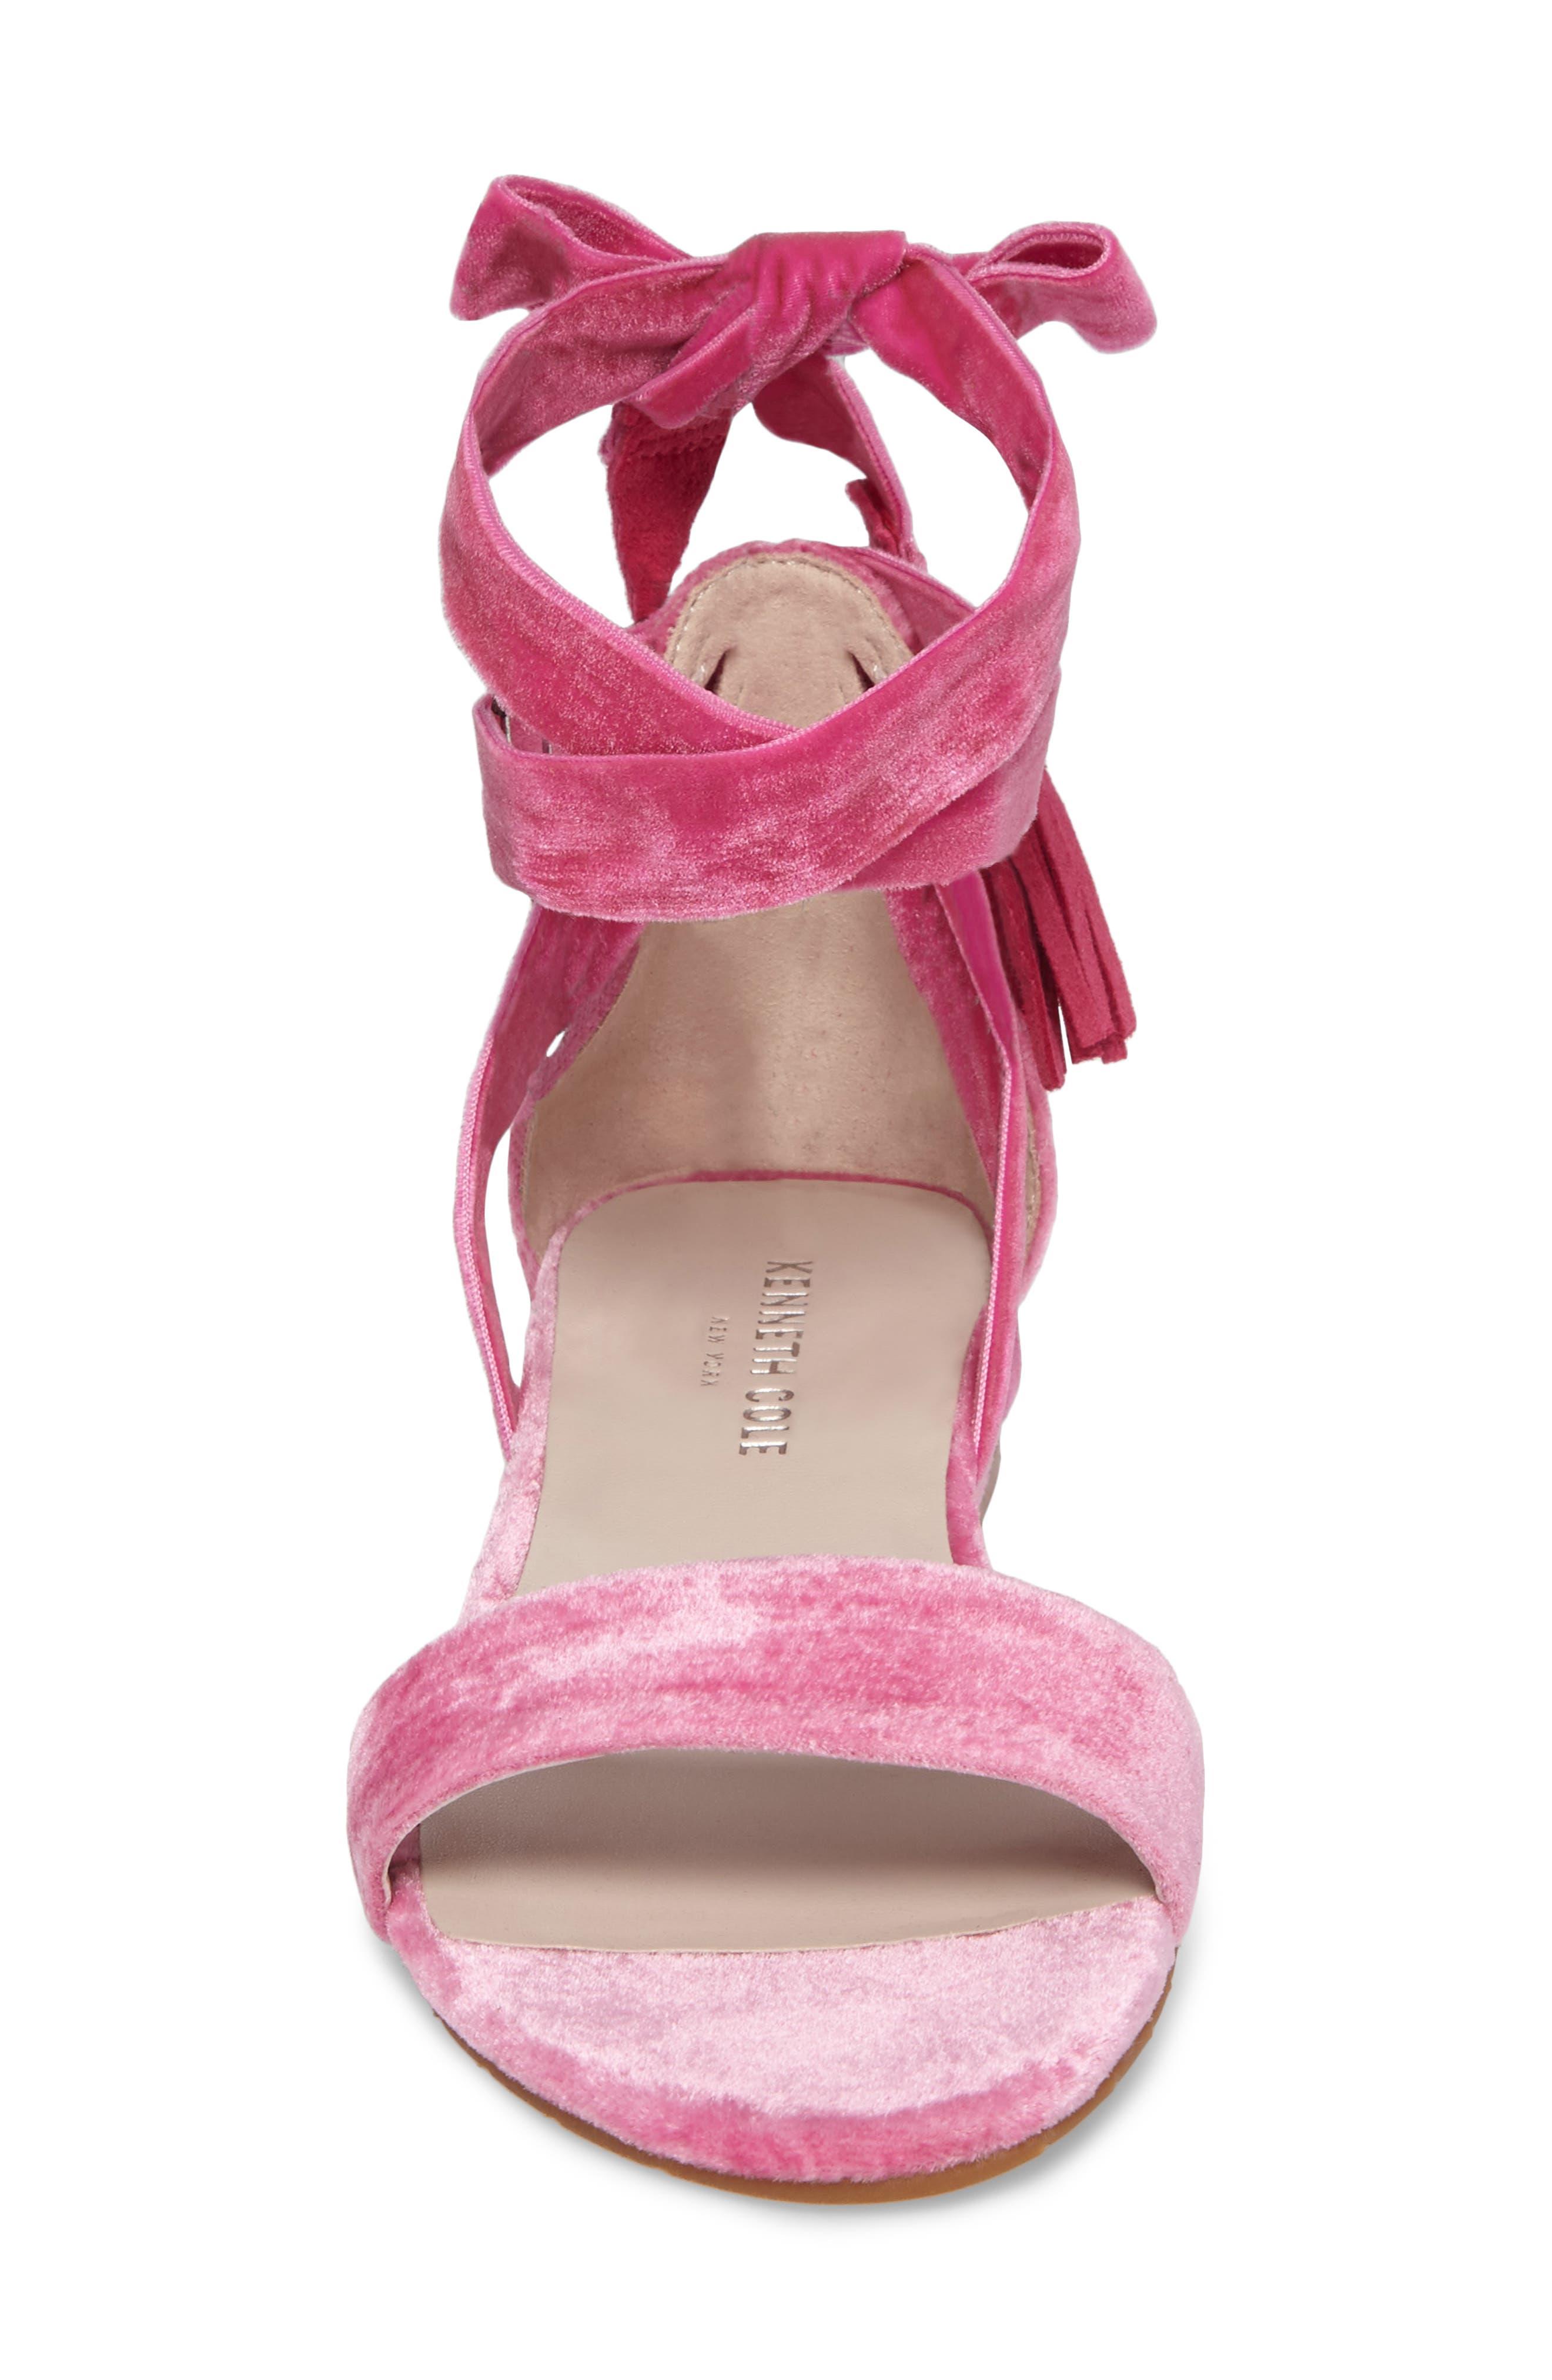 Valen Tassel Lace-Up Sandal,                             Alternate thumbnail 54, color,